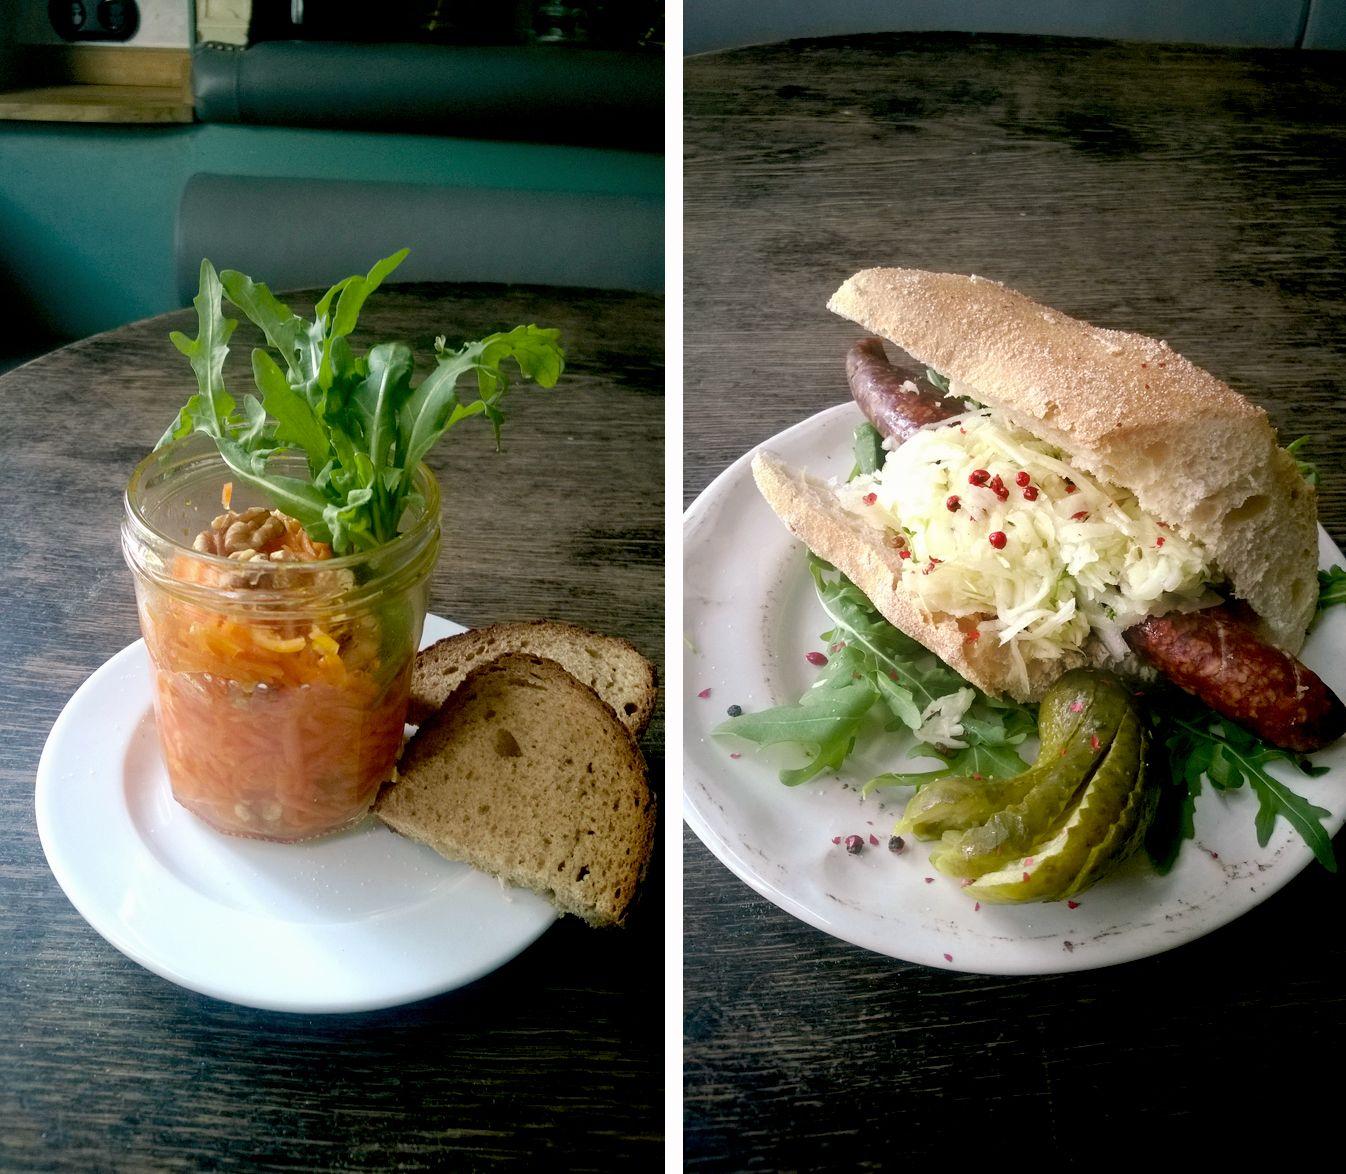 #karottensalat #berliner #hotdog #veggie #notveggie #würstchen #krautsalat #lecker #essen #bistro #berlin